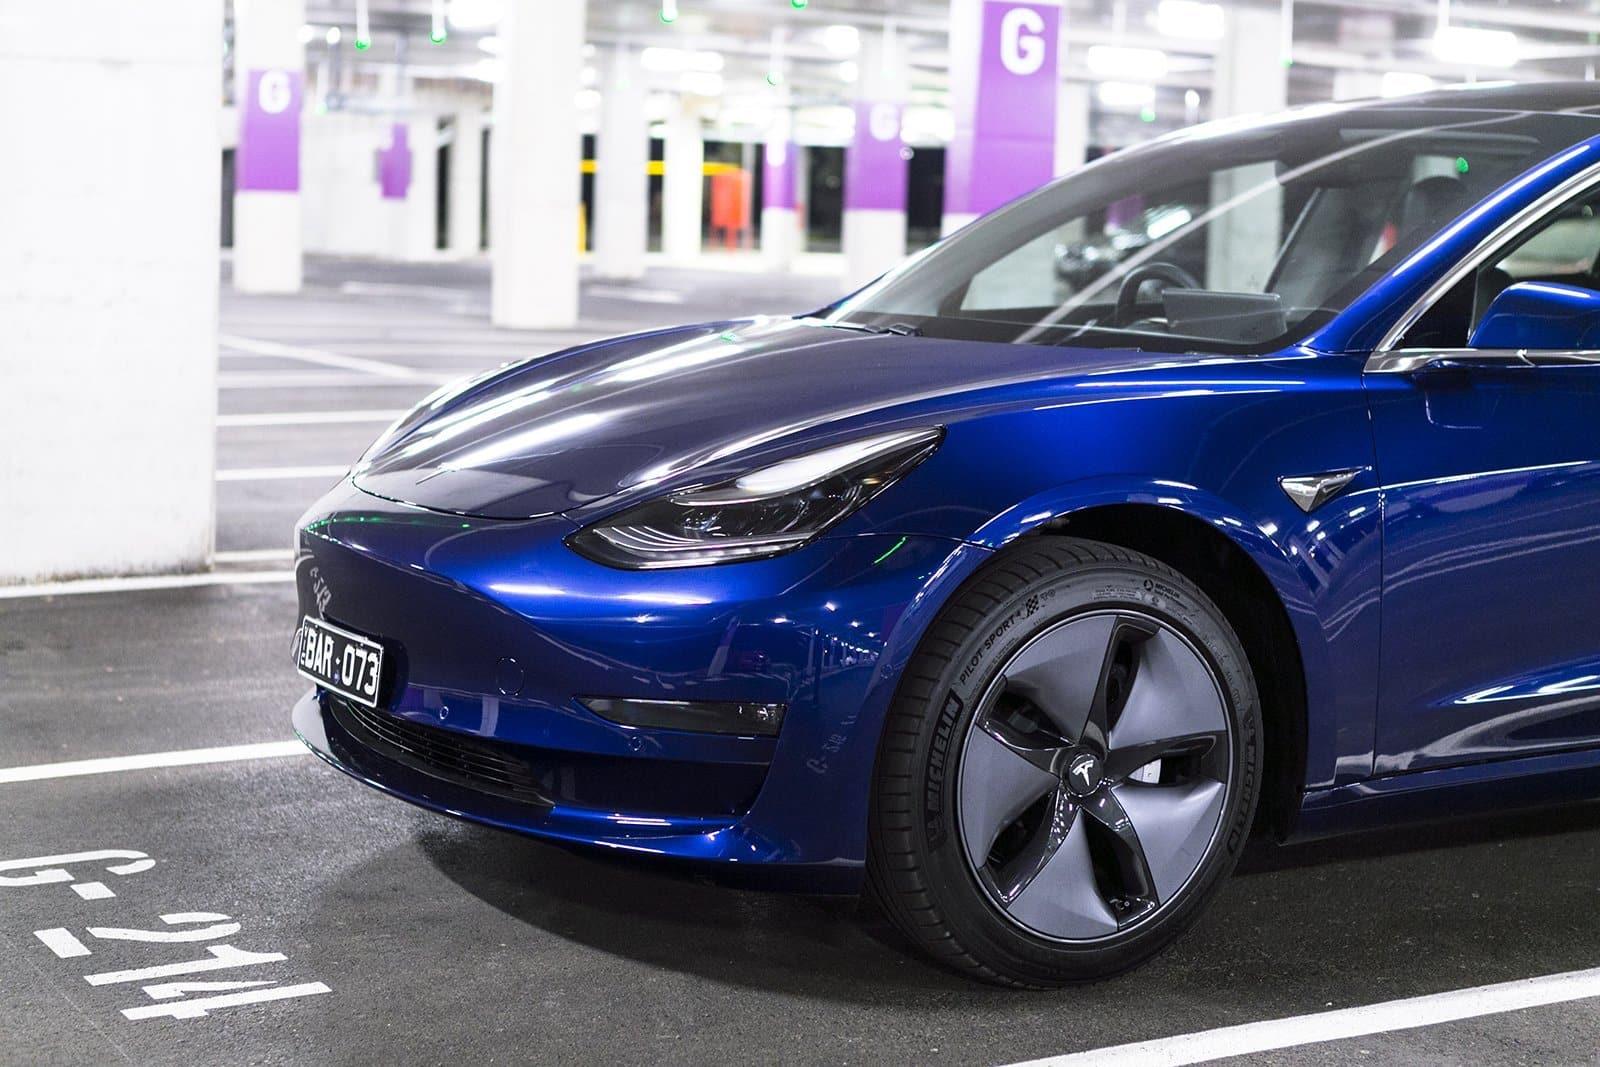 Auto Review: 2020 Tesla Model 3 Standard Range Plus